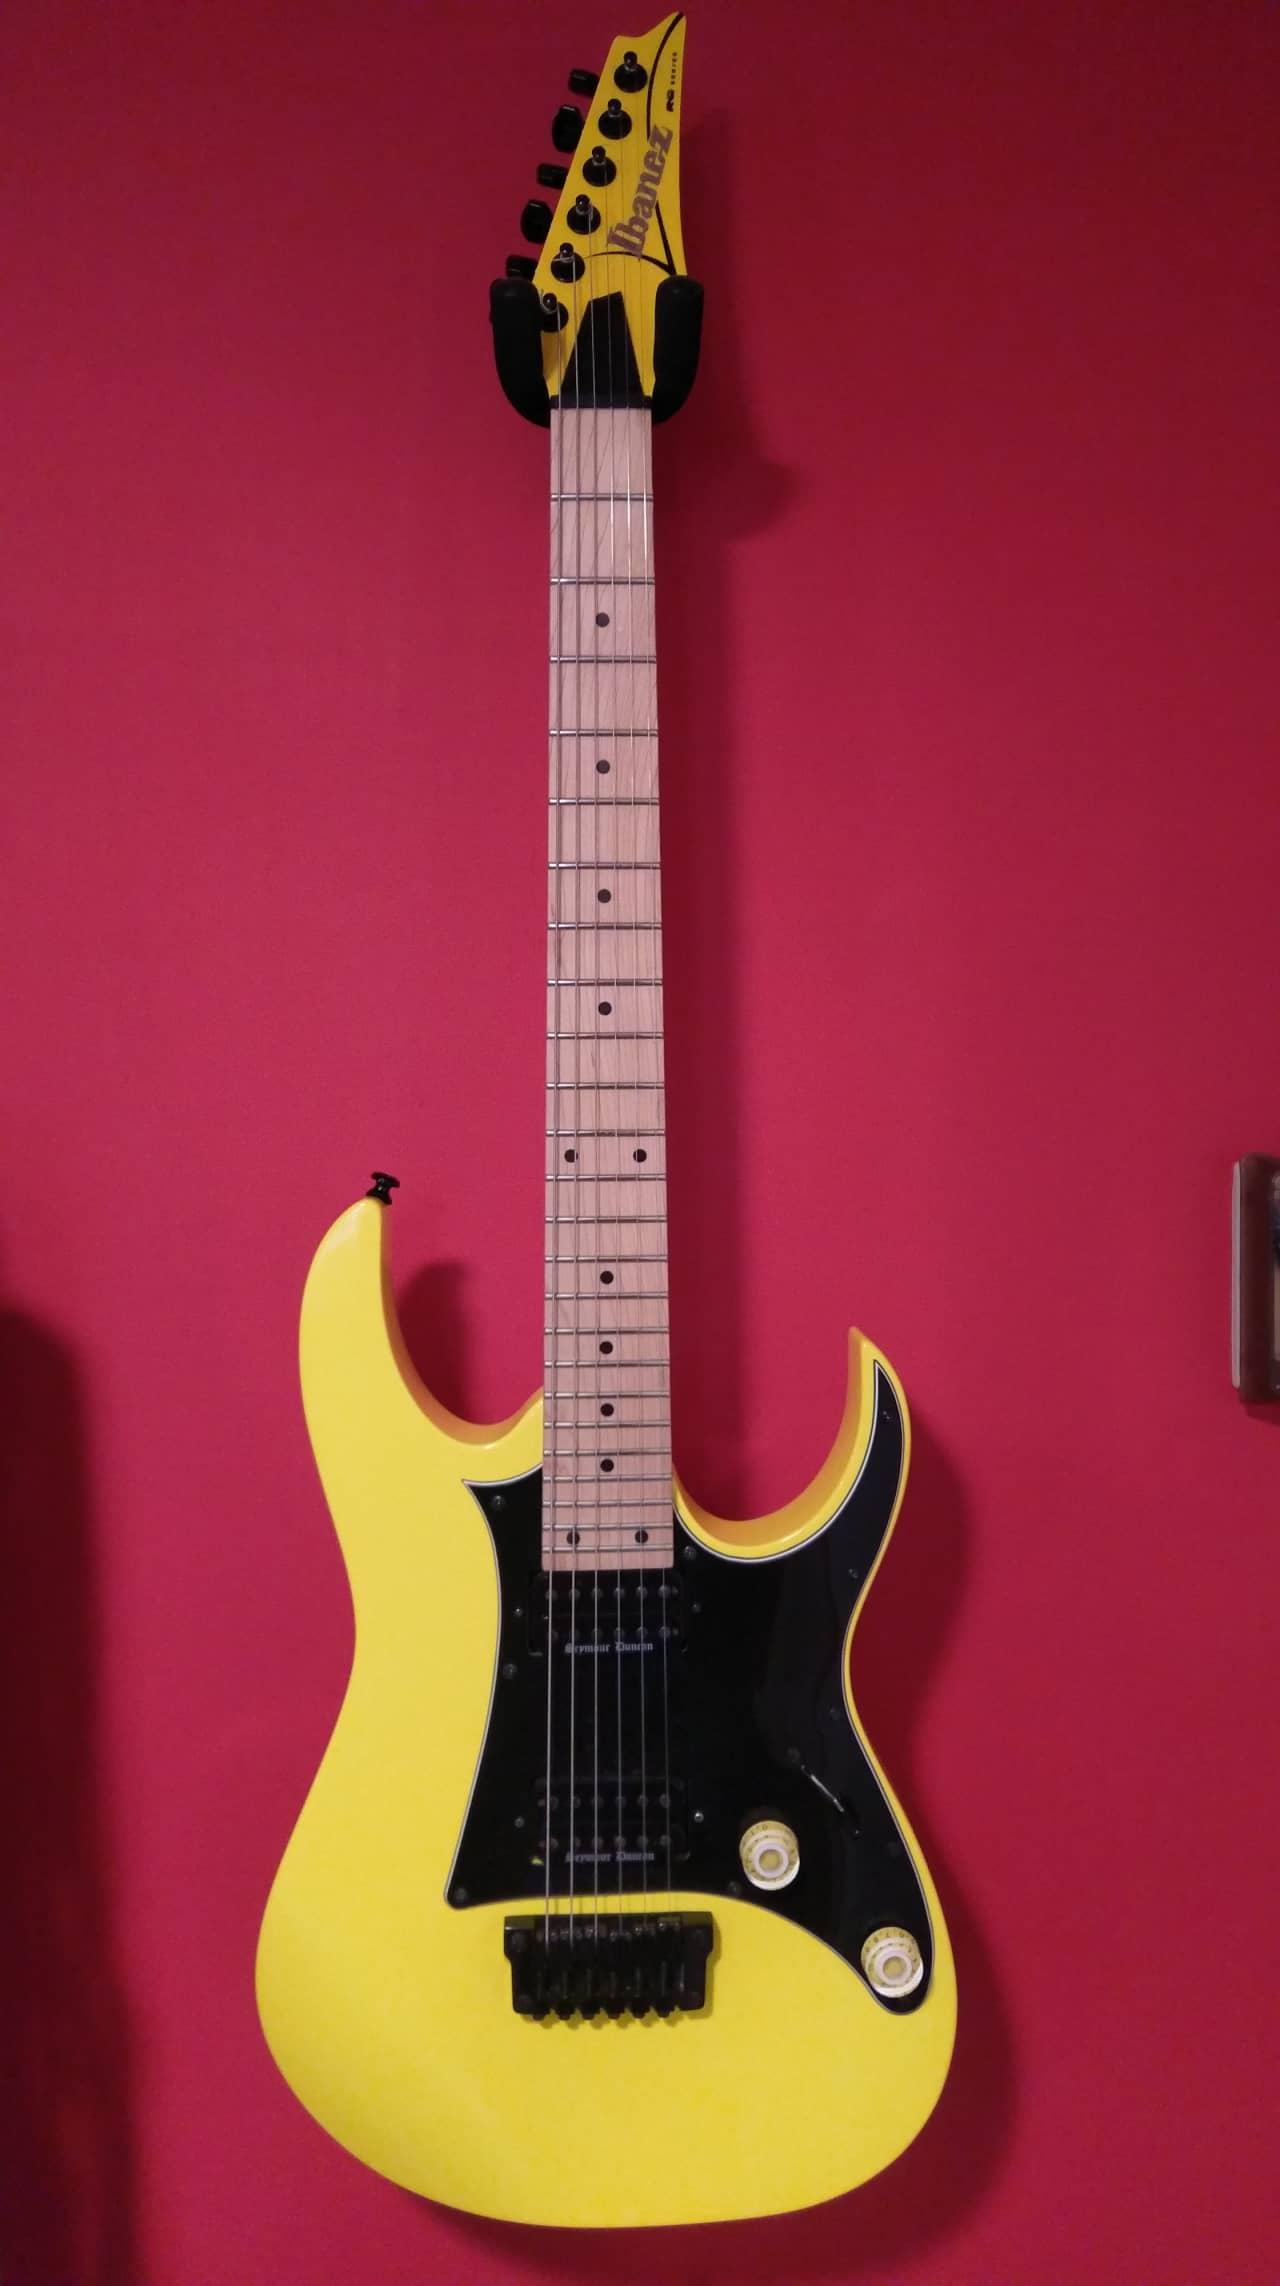 ibanez rg331m guitar with seymour duncan black winter pickups reverb. Black Bedroom Furniture Sets. Home Design Ideas